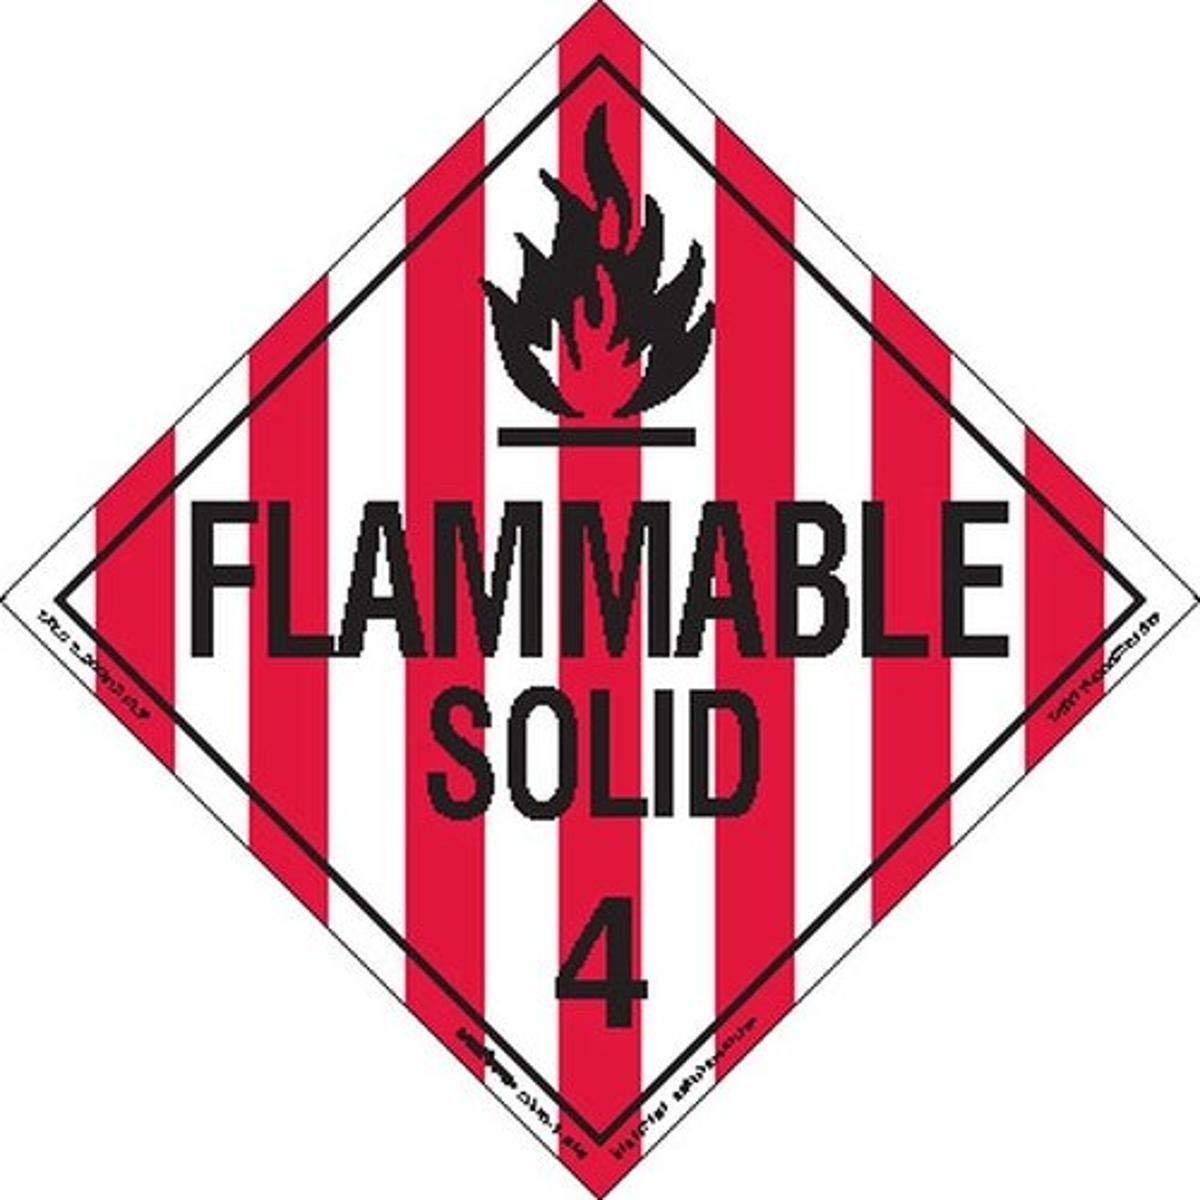 Labelmaster Z-EZ13 Flammable Solid Hazmat Worded Placard security E-Z Max 79% OFF R